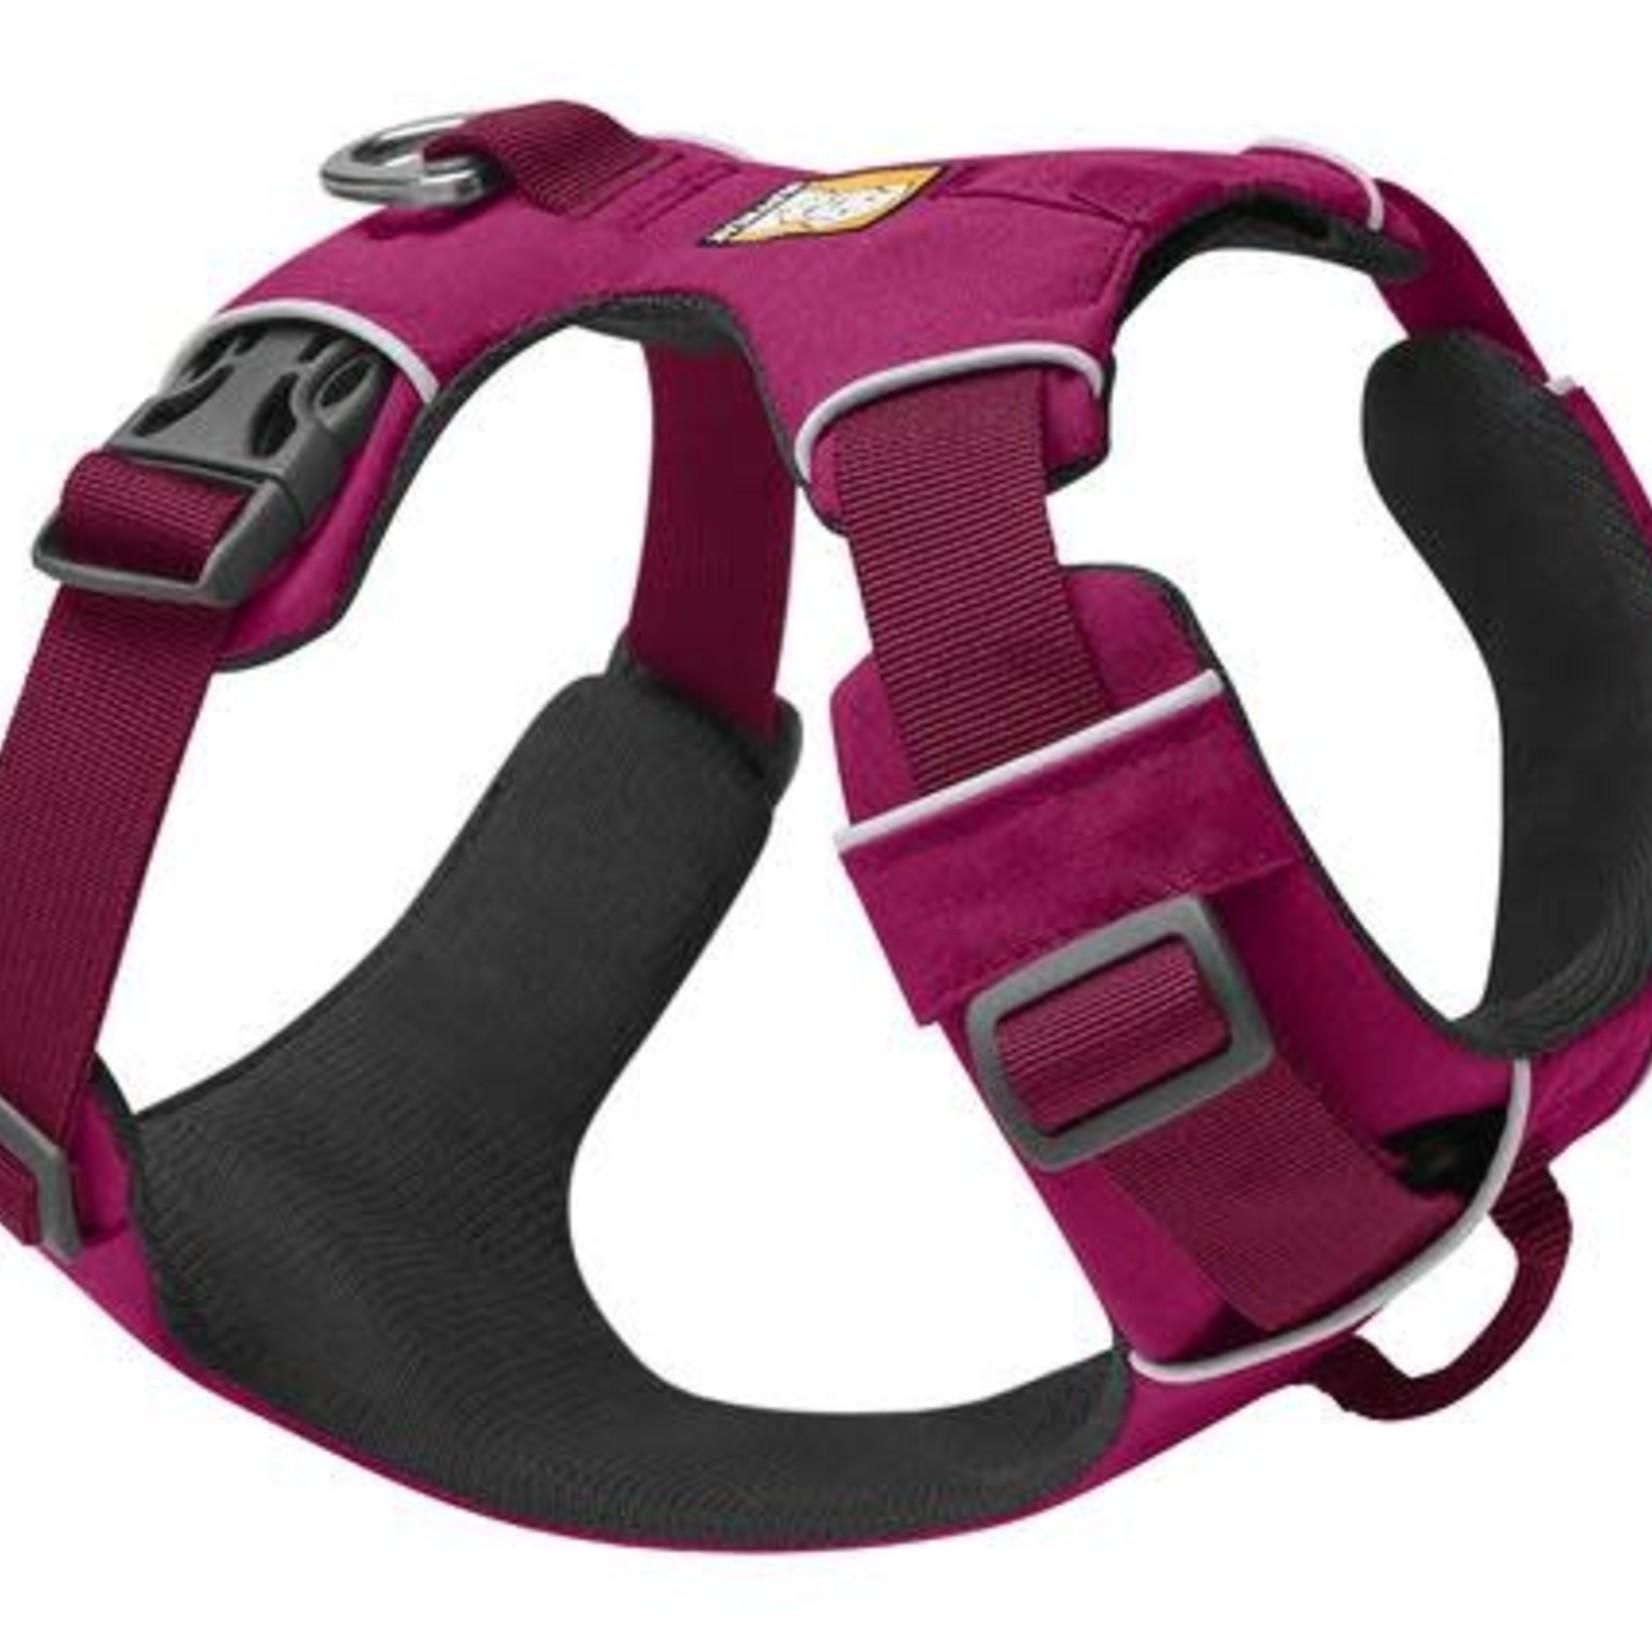 Ruff Wear Ruffwear Front Range Harness Hibiscus Pink Medium